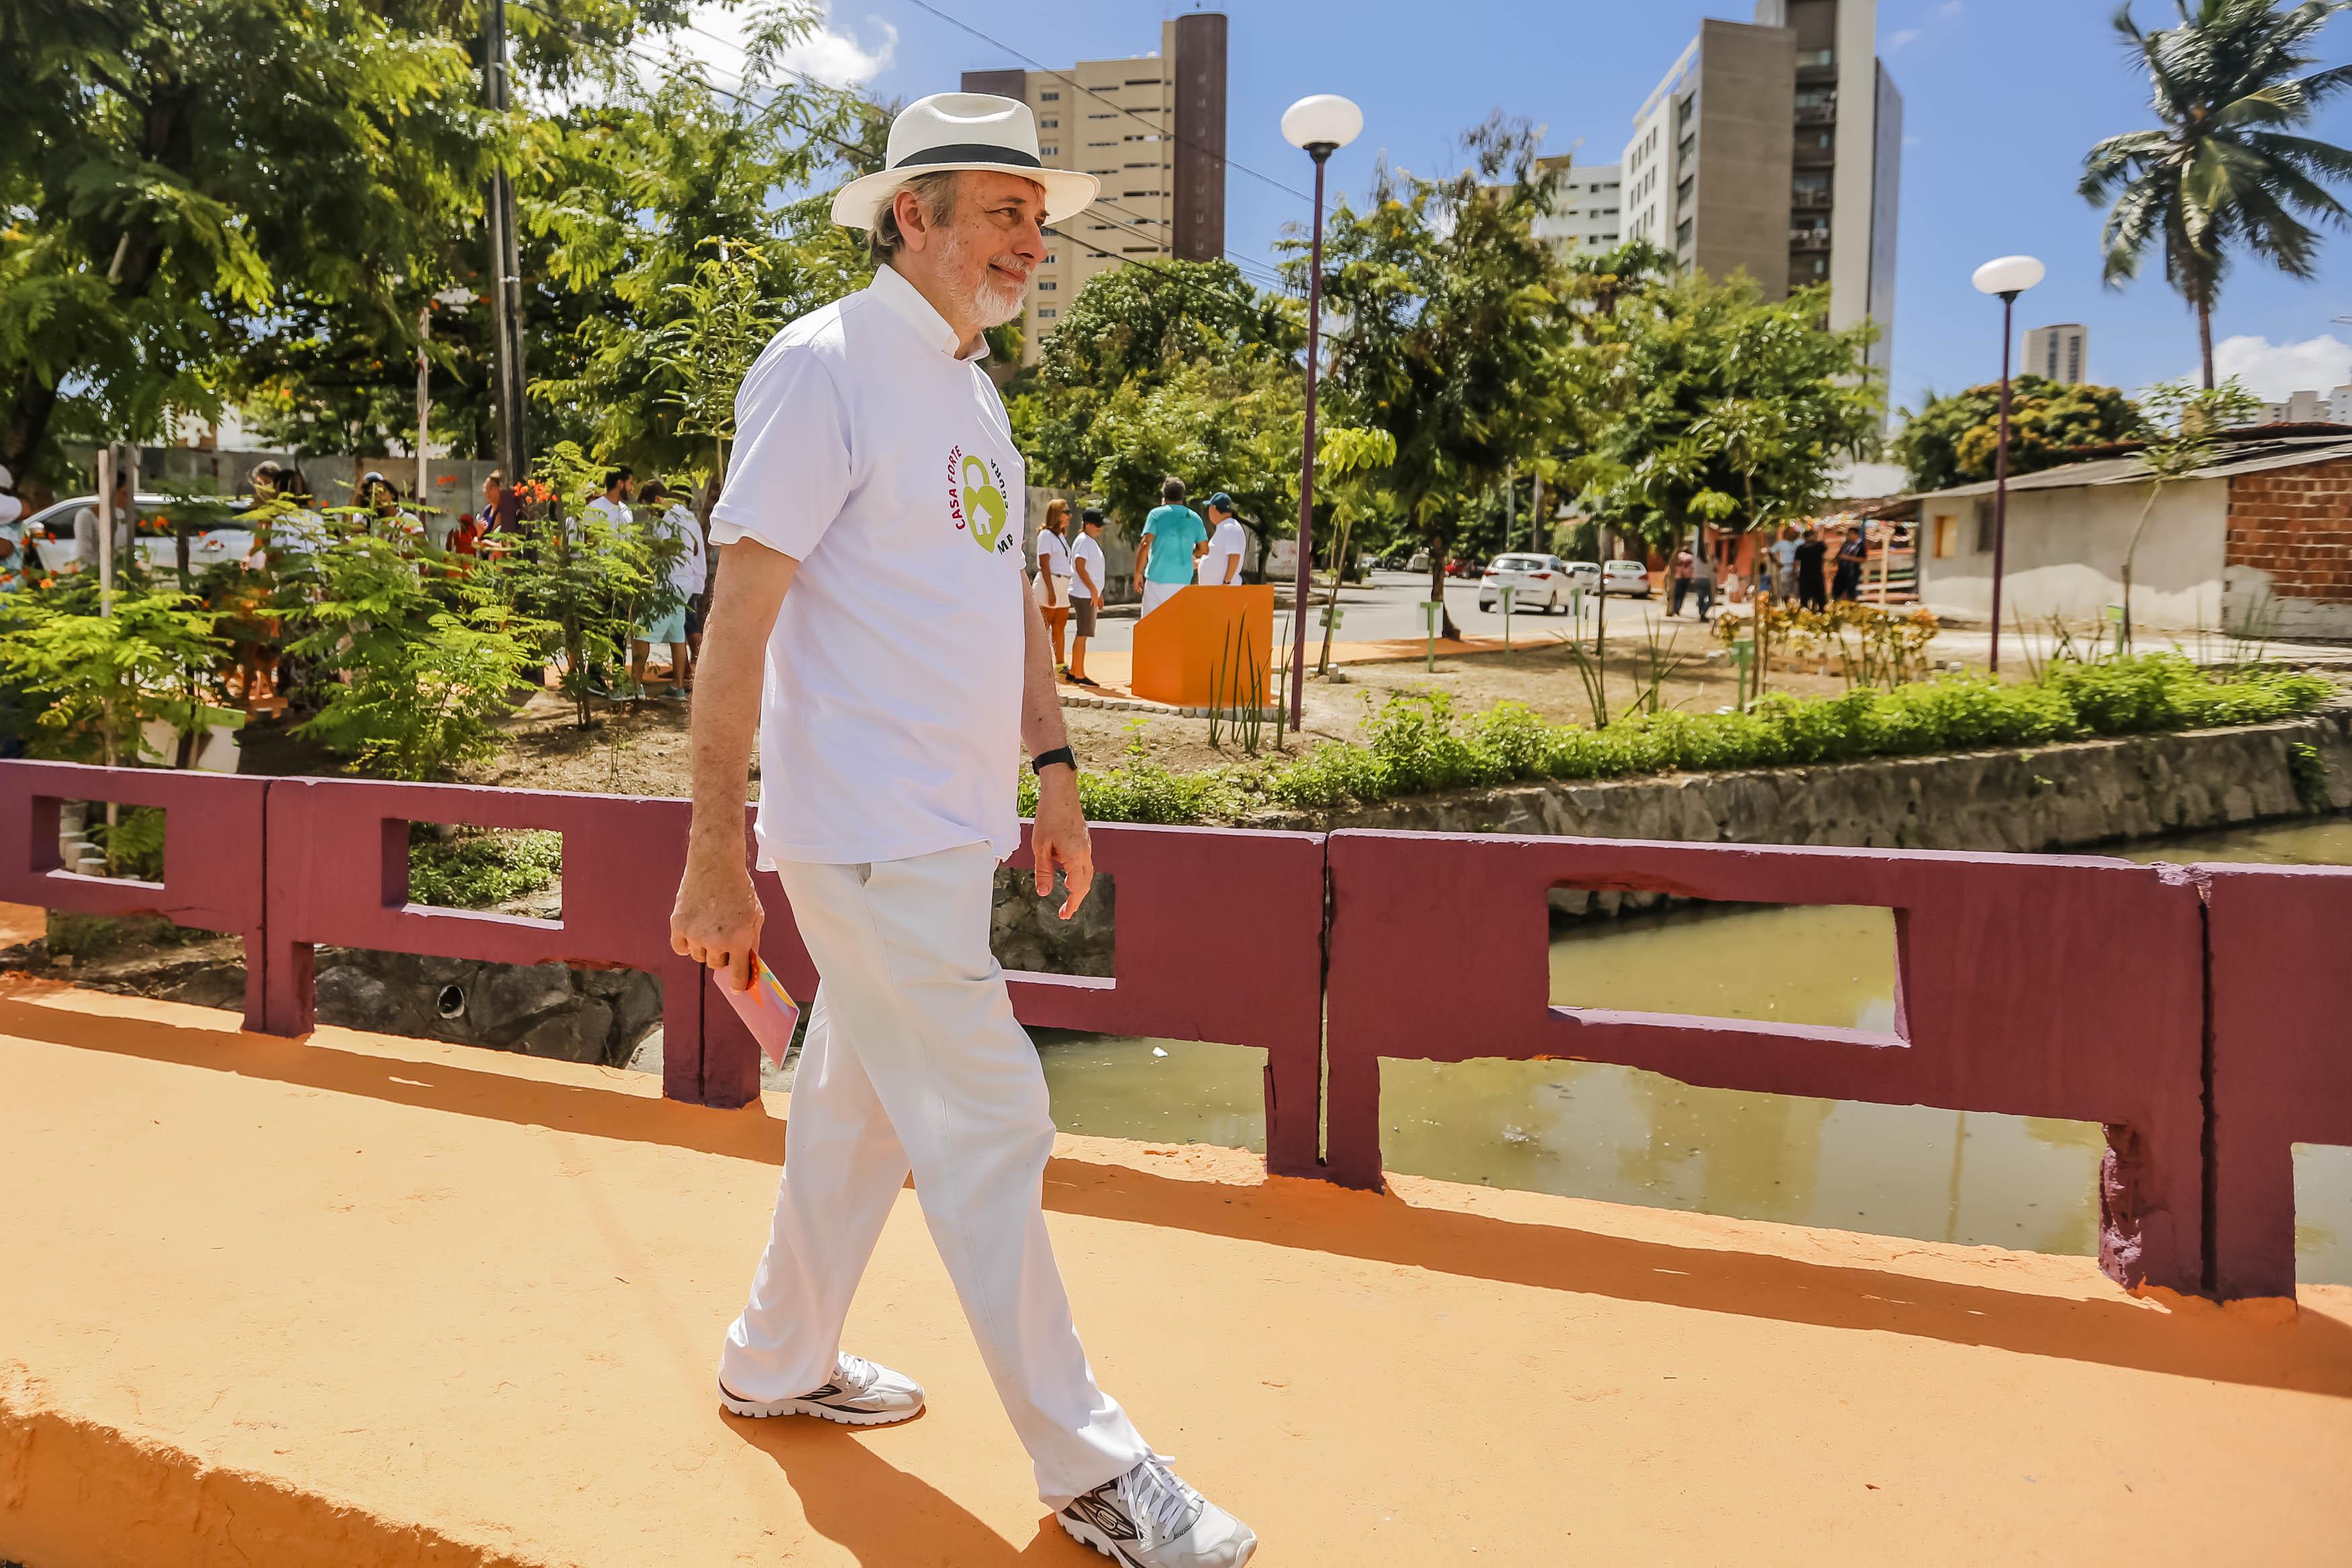 Área era utilizada para descarte de lixo. Foto: Andréa Rego Barros/Prefeitura do Recife.